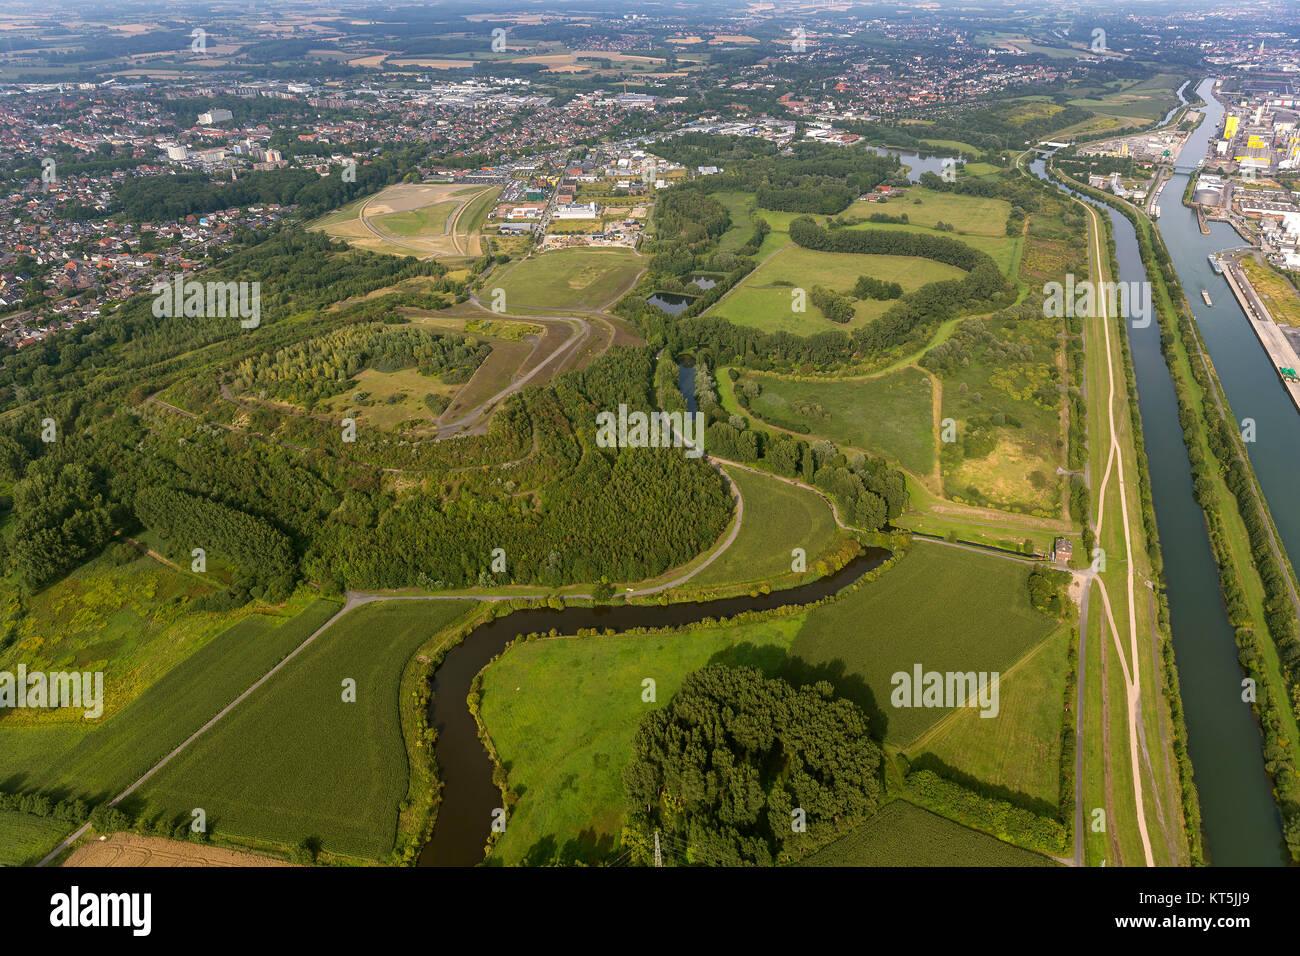 western course of the Lippe and Lippemäander, Hamm, Ruhr area, North Rhine-Westphalia, Germany, Europe, Hamm, - Stock Image